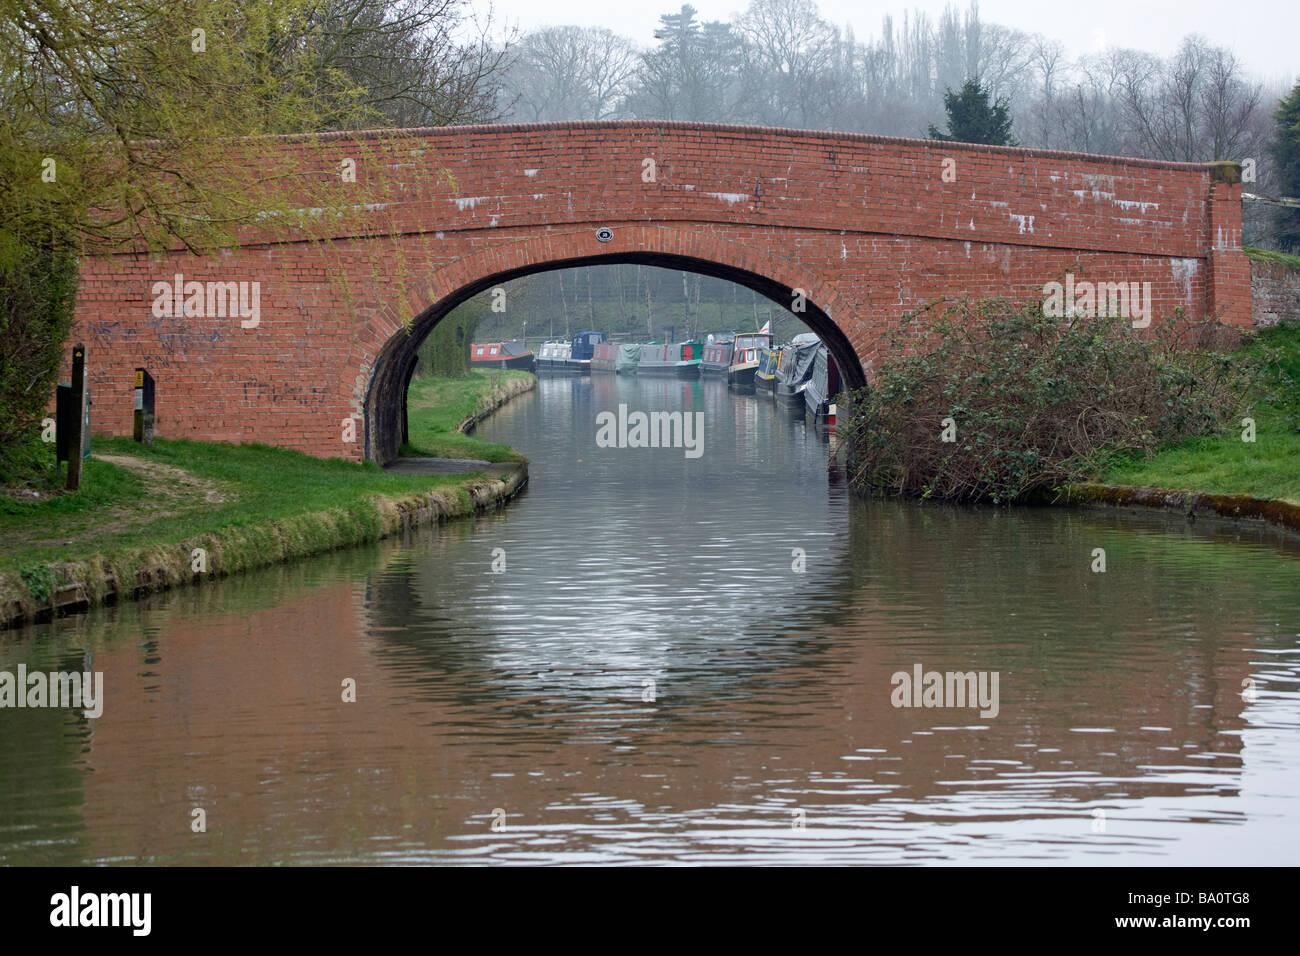 Approaching Bridge on Grand Union Canal Stock Photo